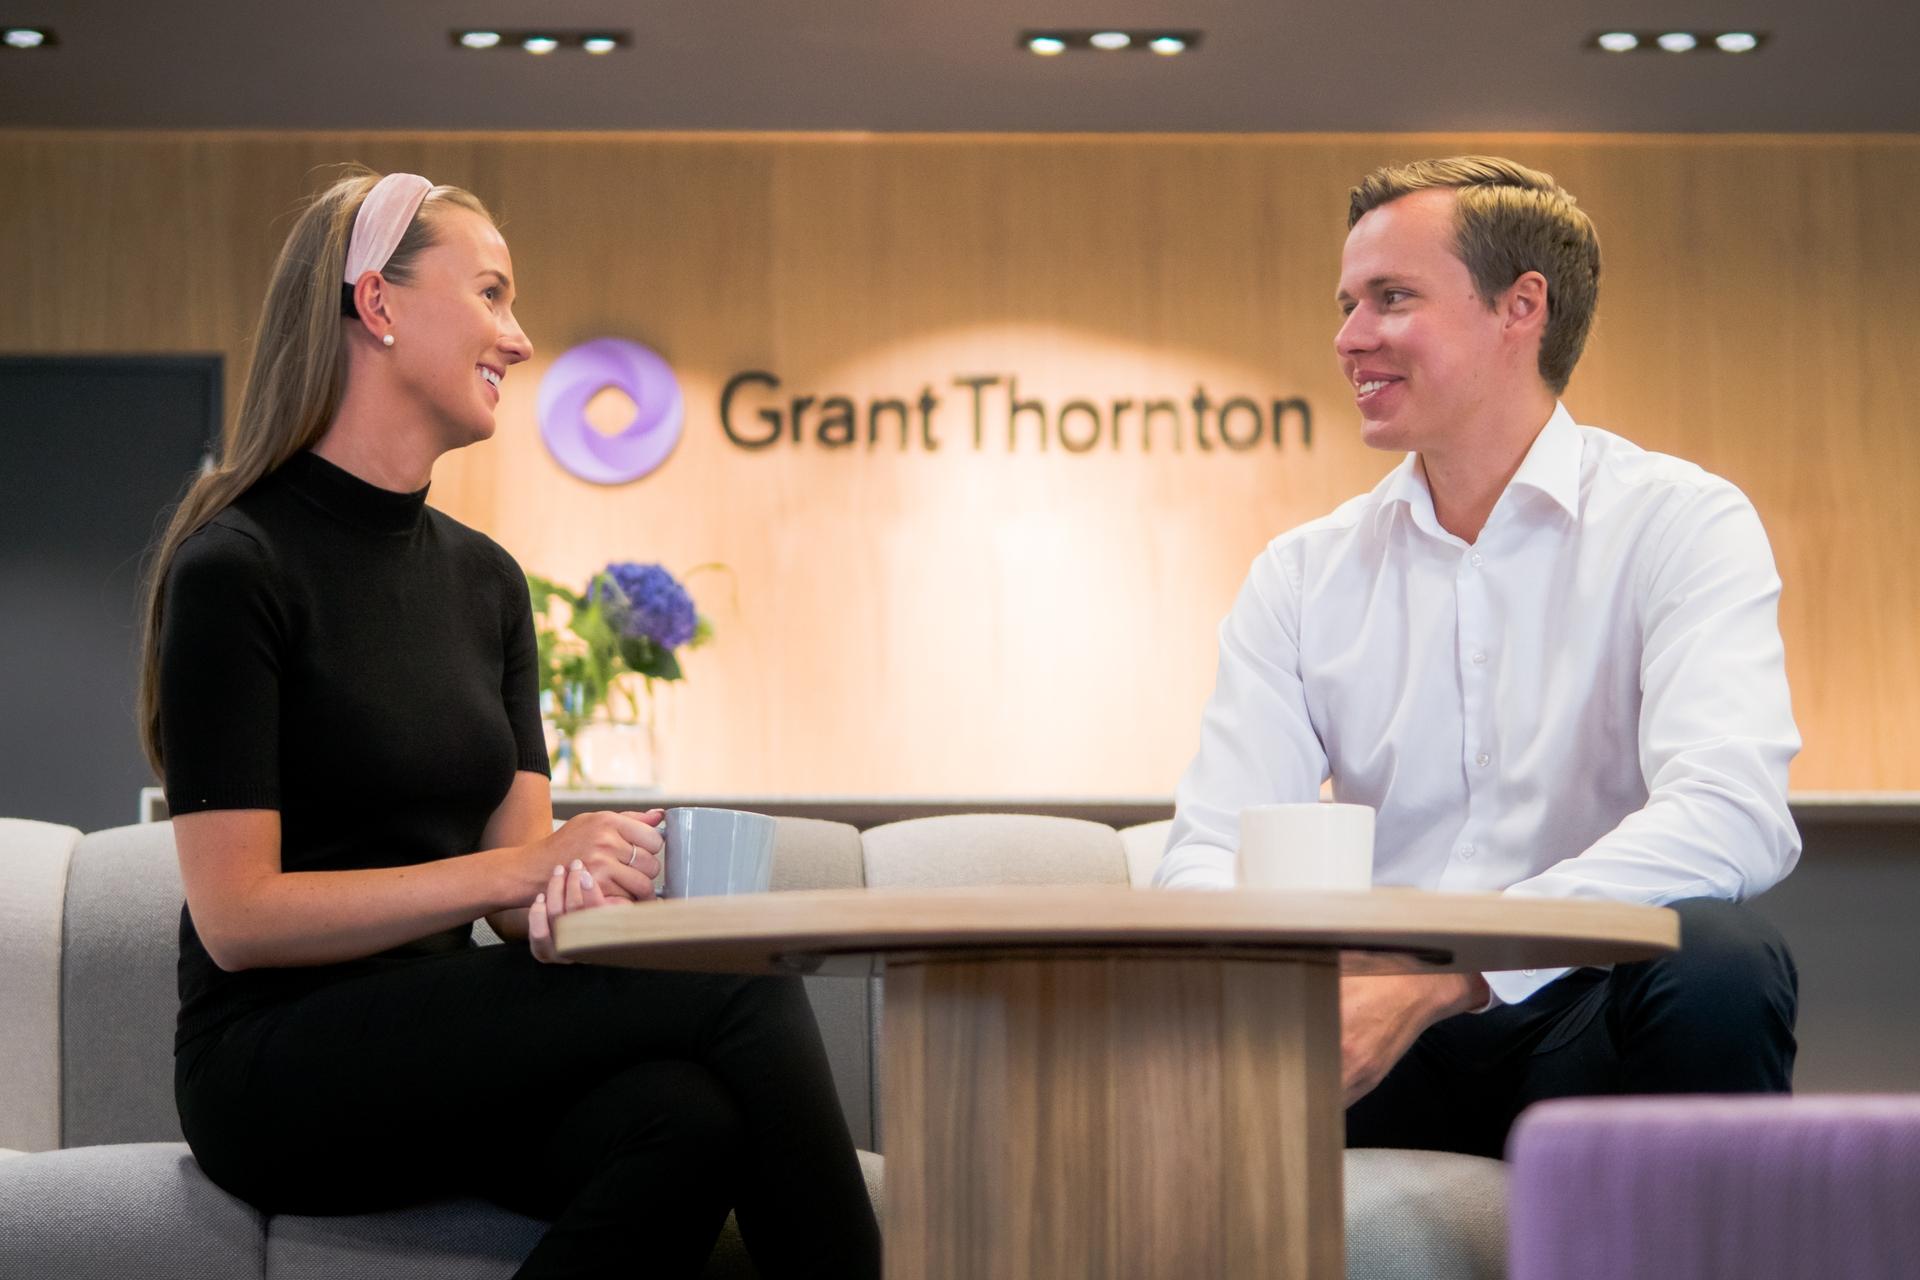 Grant_thornton_trainee